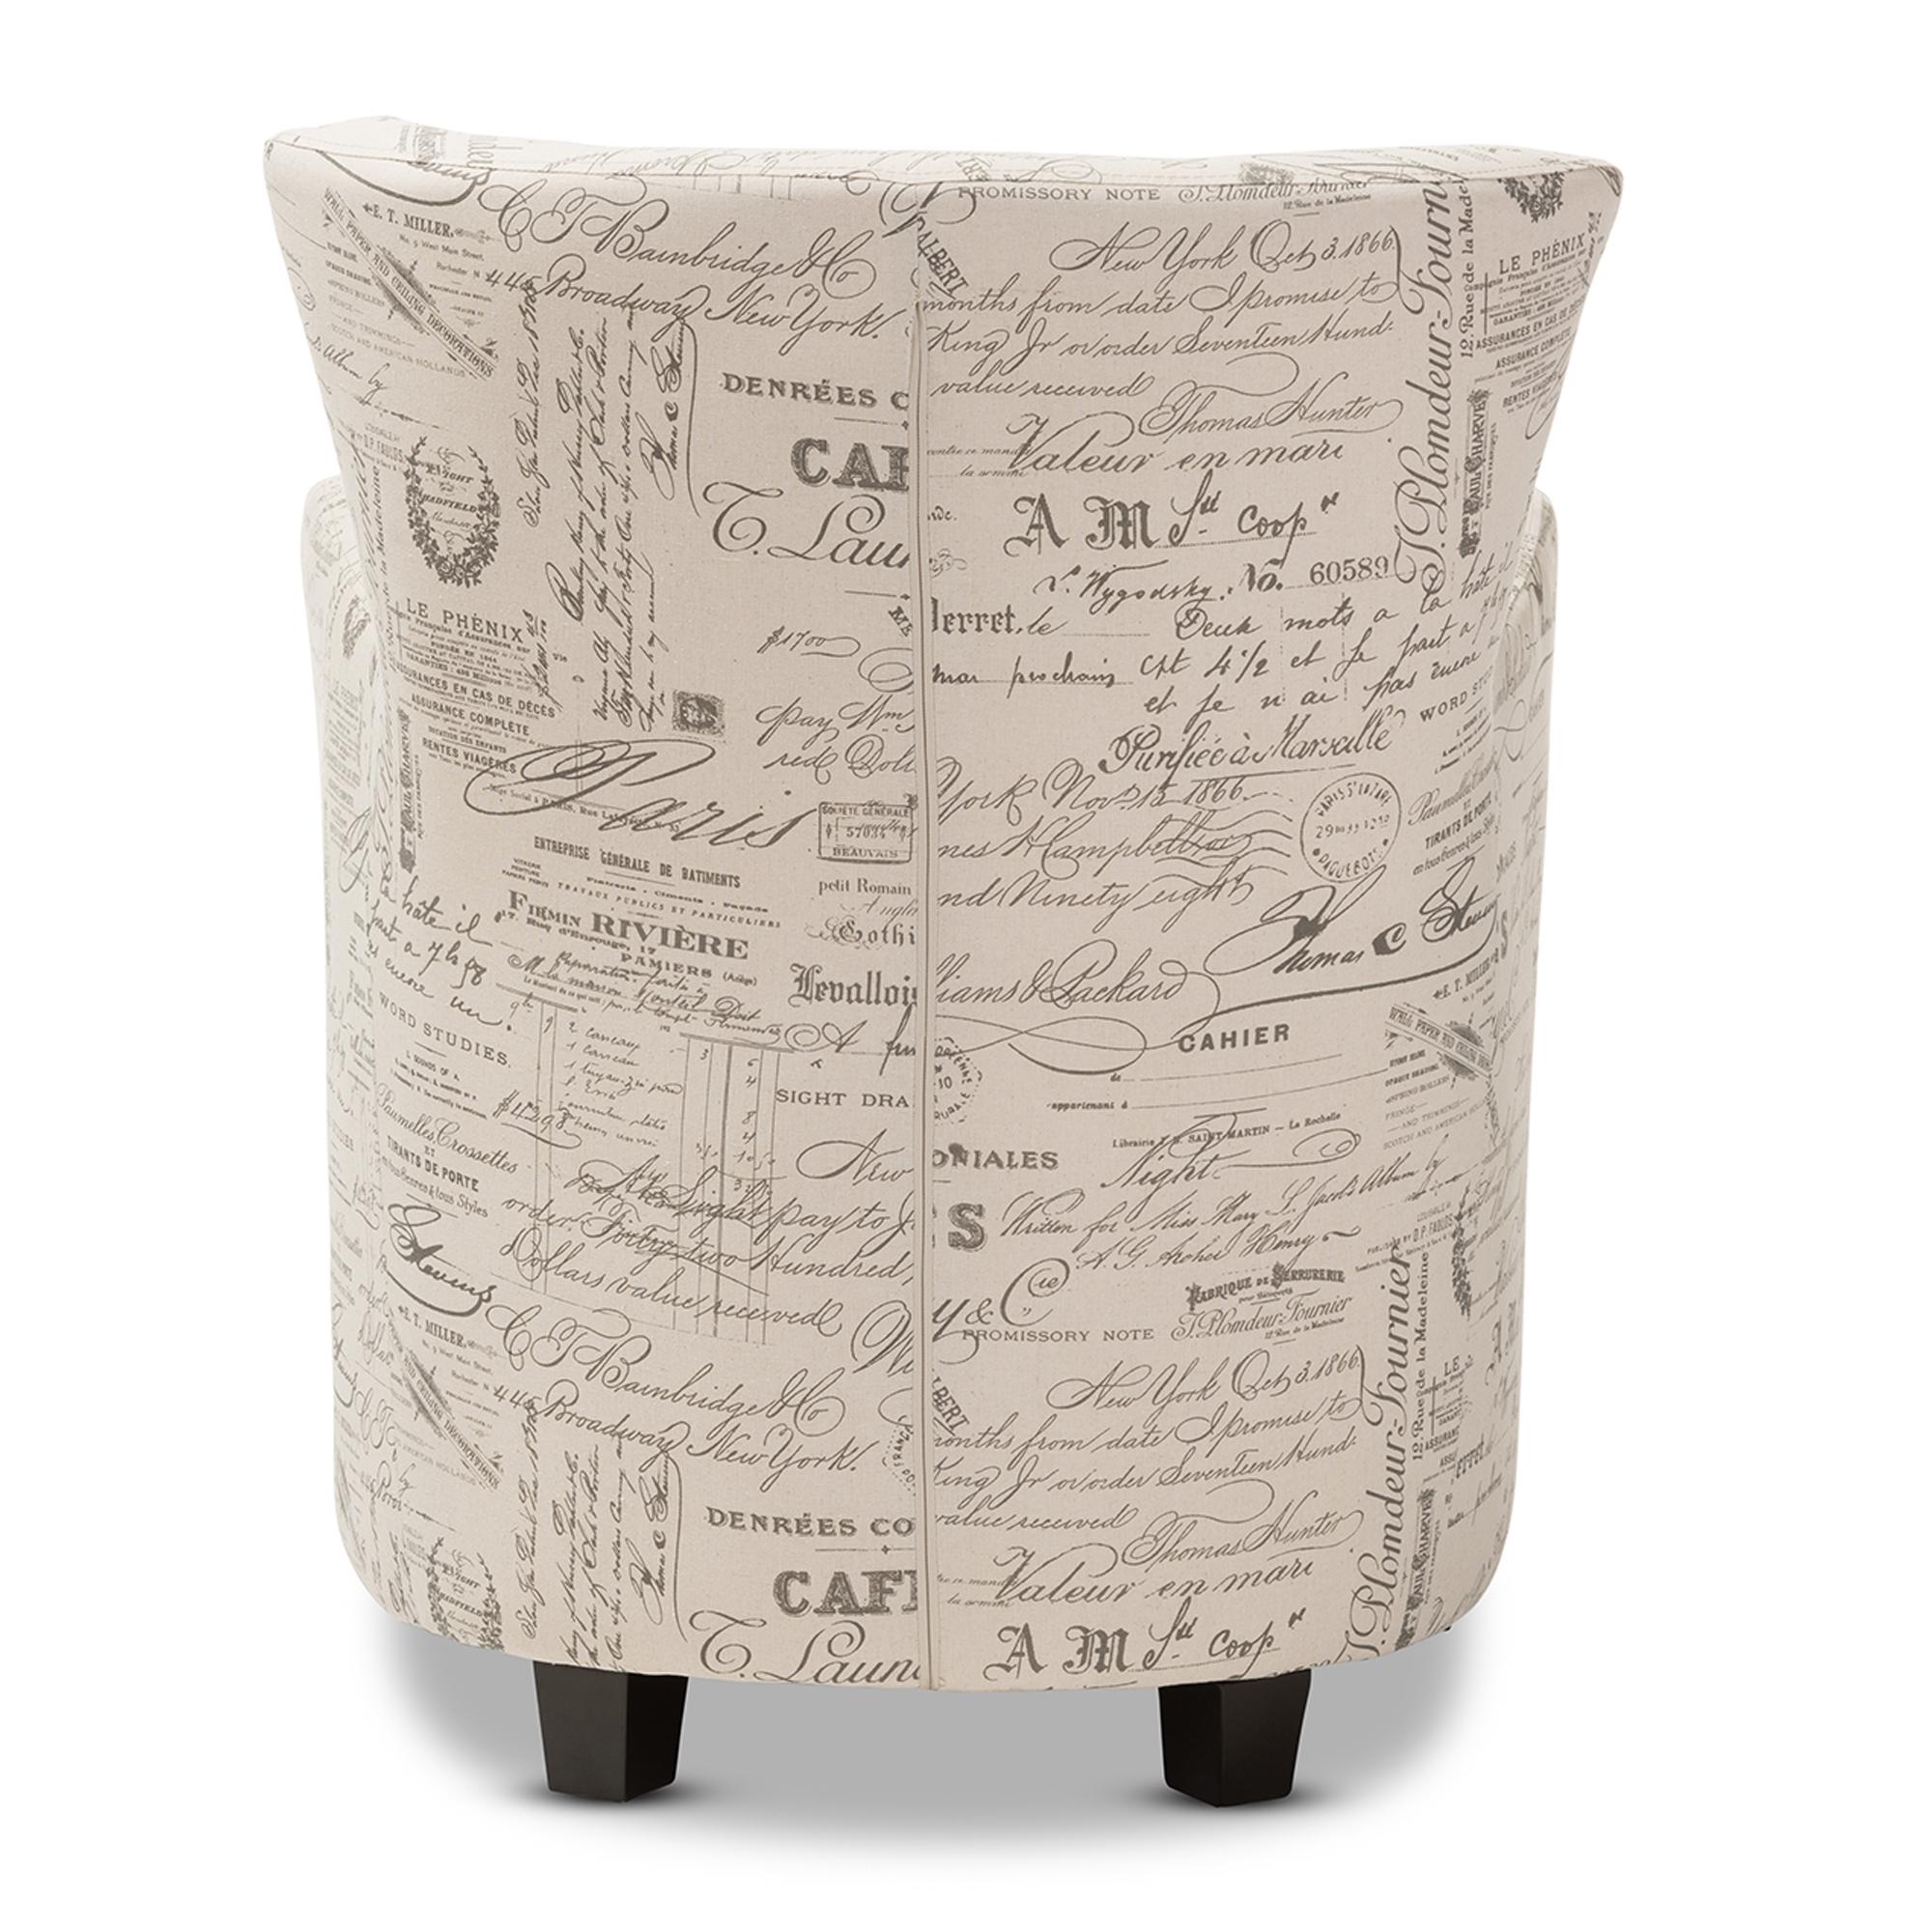 Baxton Studio Benson French Script Patterned Fabric Club